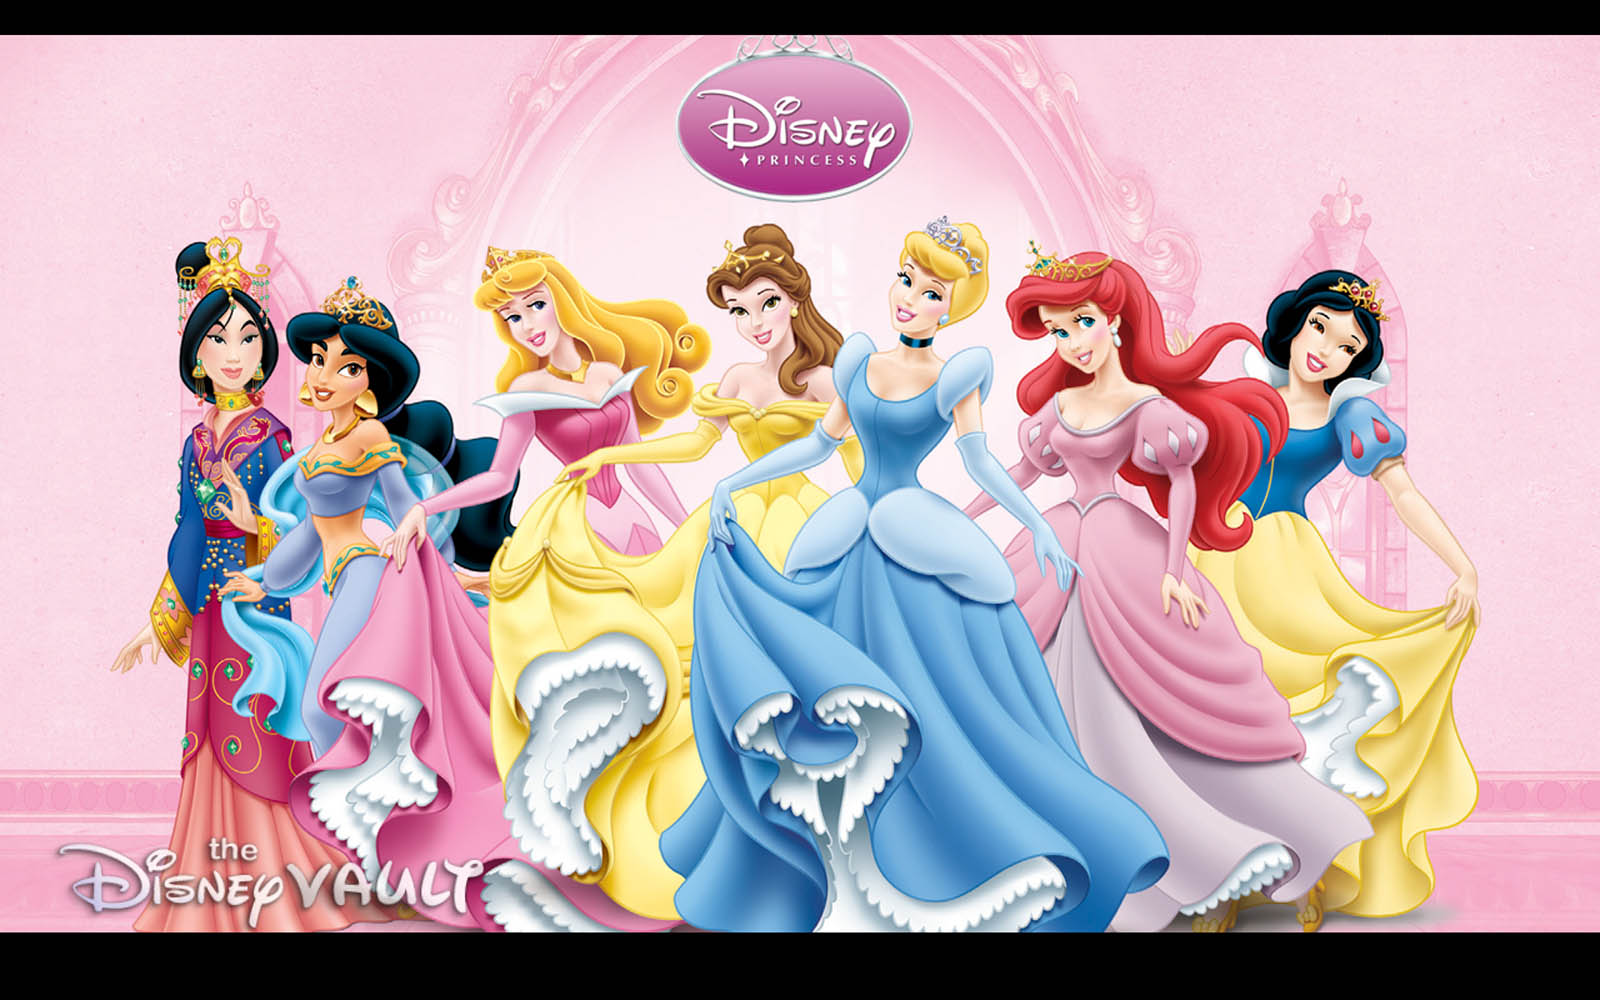 wallpapers: Disney Princess Wallpapers